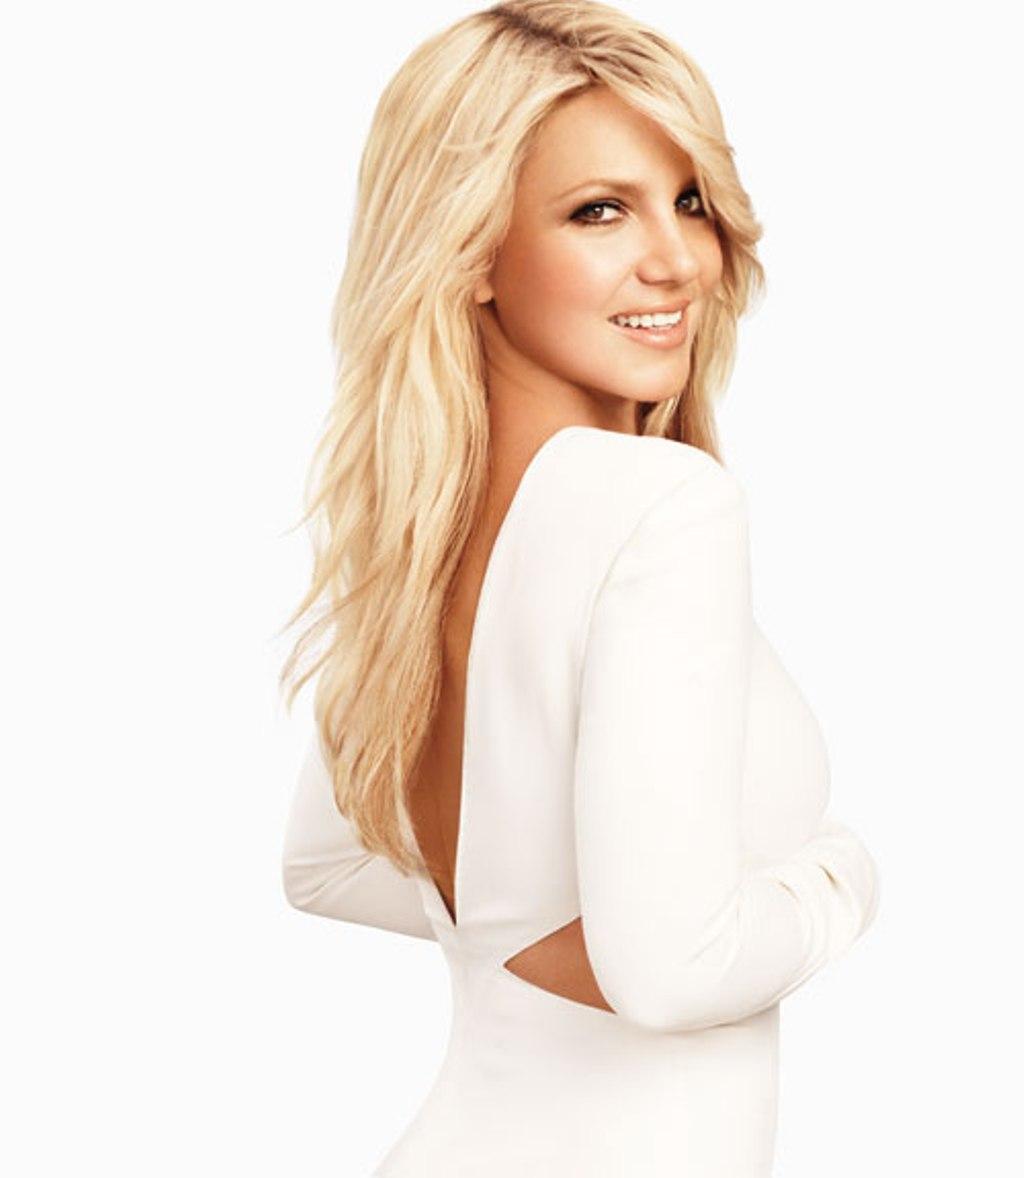 http://1.bp.blogspot.com/-HOx_wdZBMHE/TkcaXFVPp3I/AAAAAAAAATc/i8b6n6I4nZc/s1600/Britney-Spears-Harpers-Bazaar-June-July-2011-05.jpg